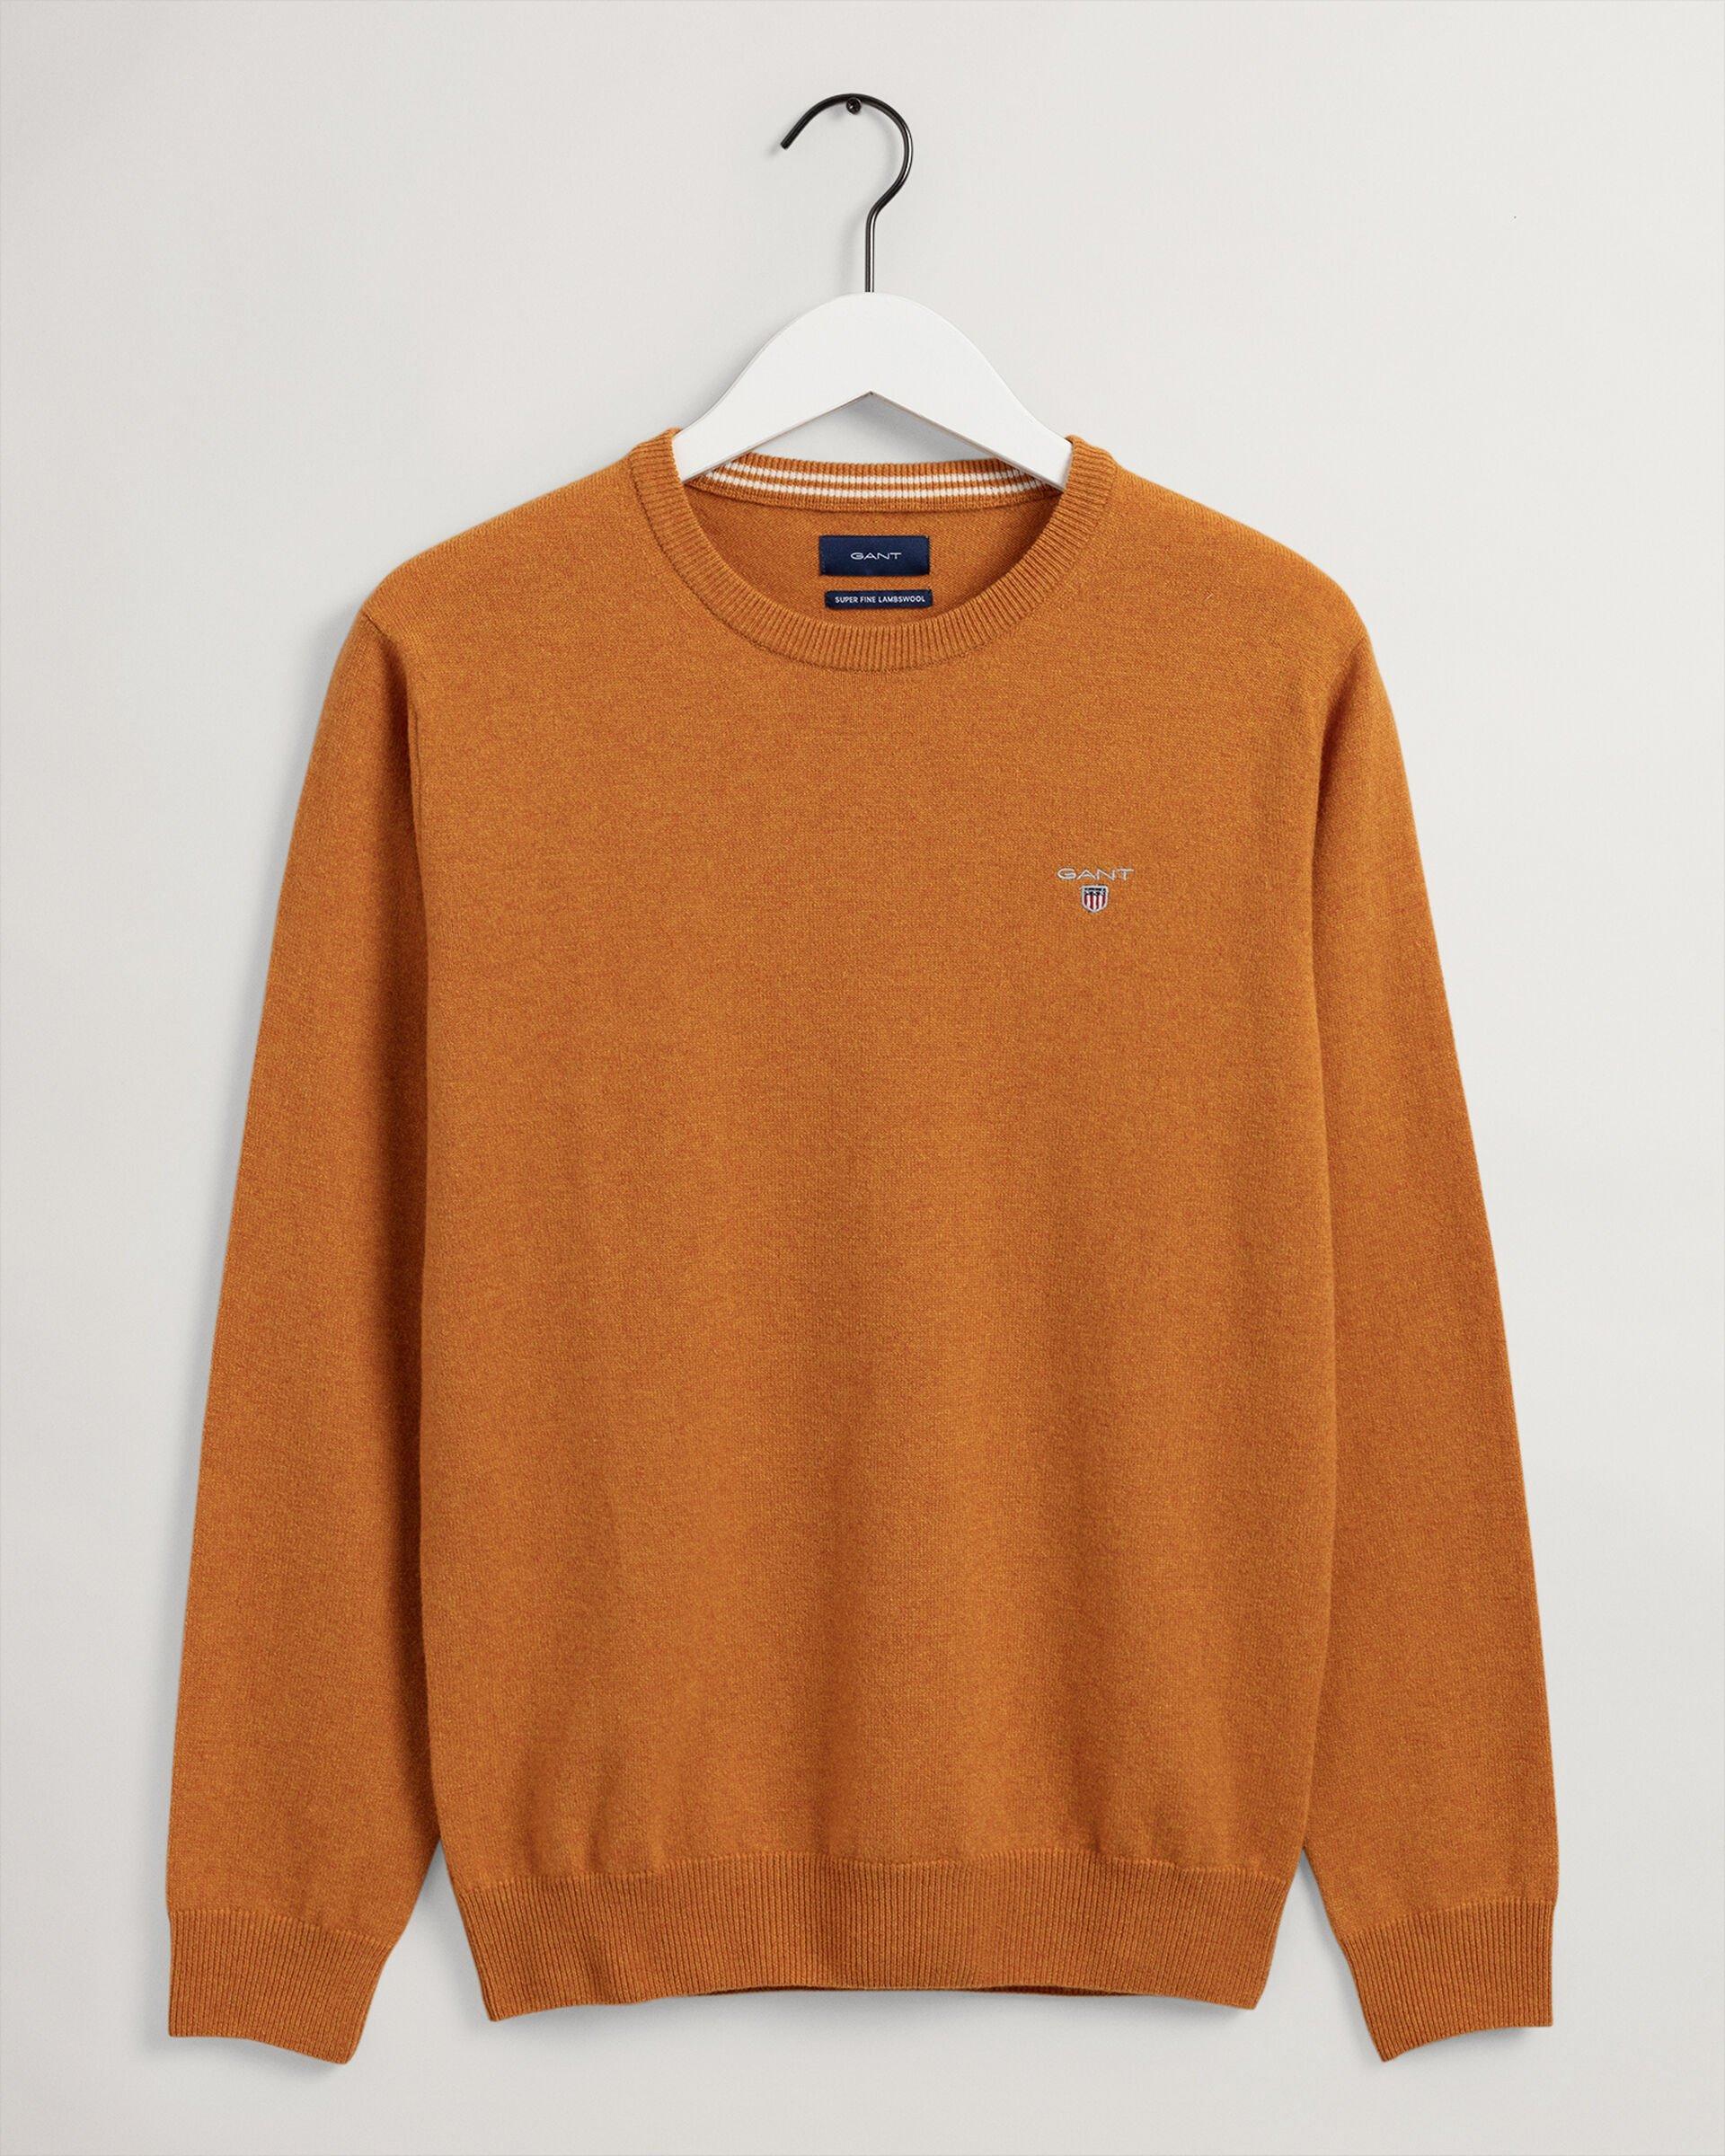 Gant Crewneck Striktrøje, Dark Mustard Orange, M